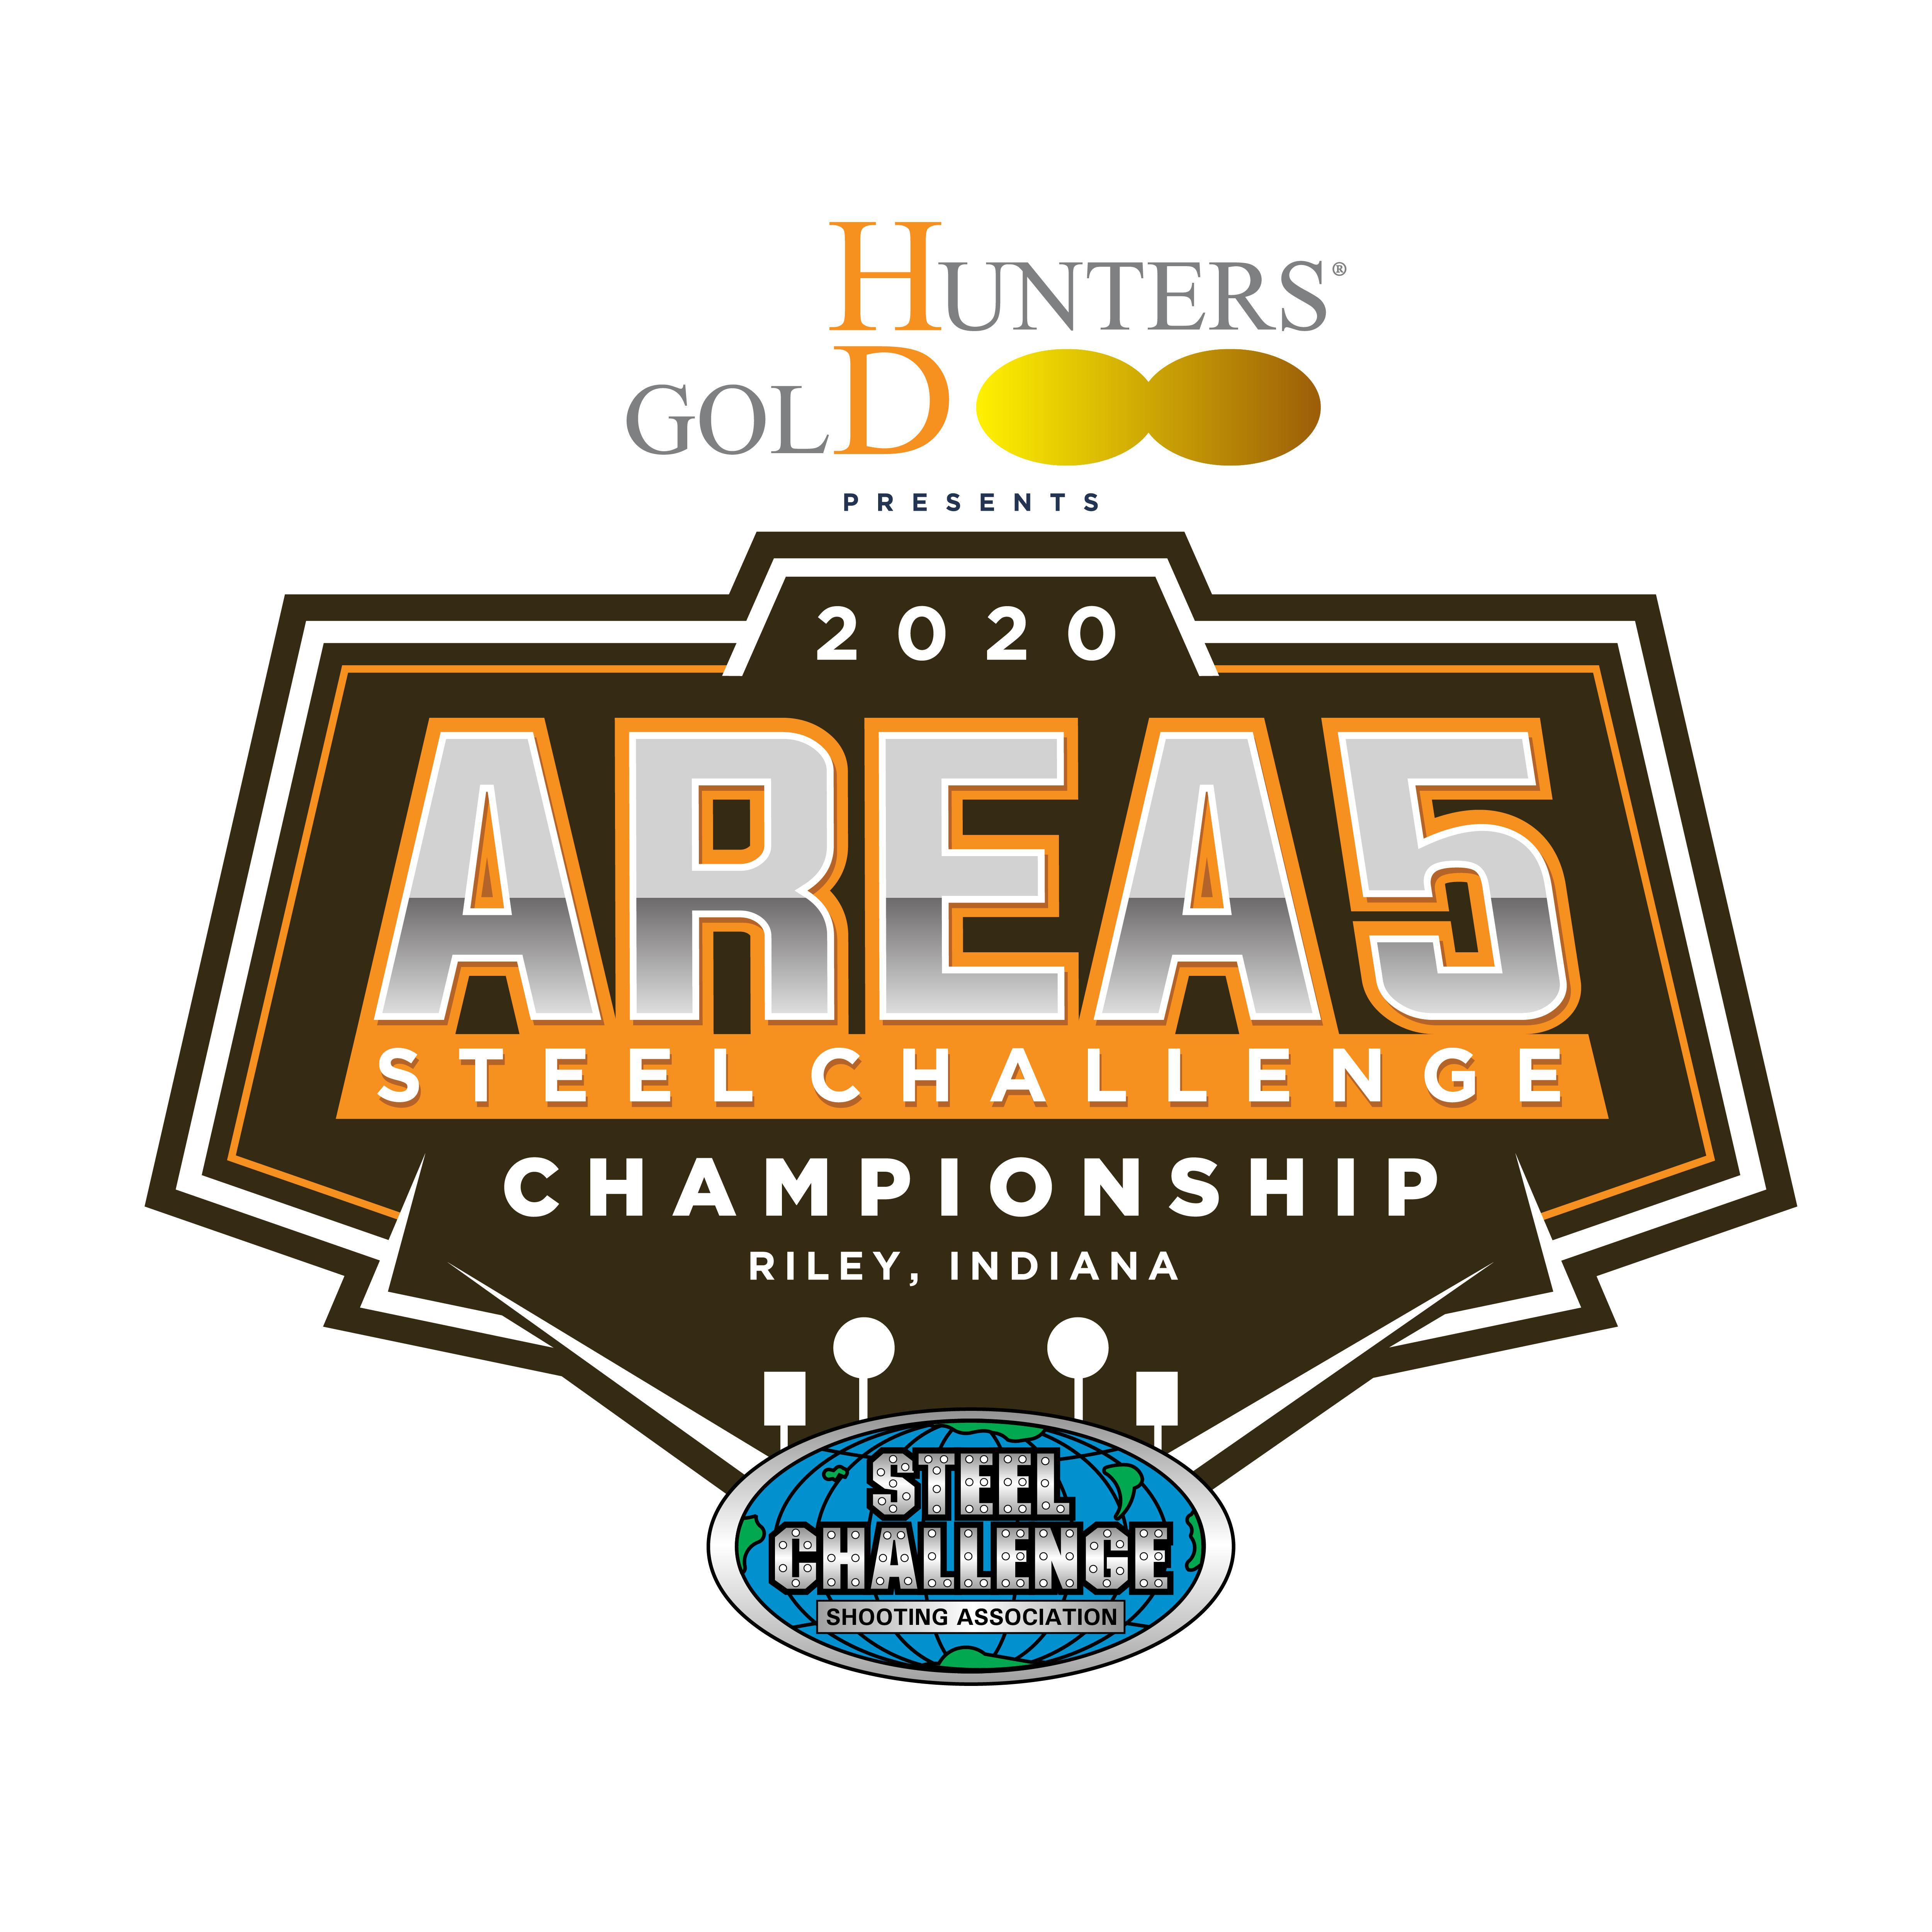 2020 Area 5 Steel Challenge Championship